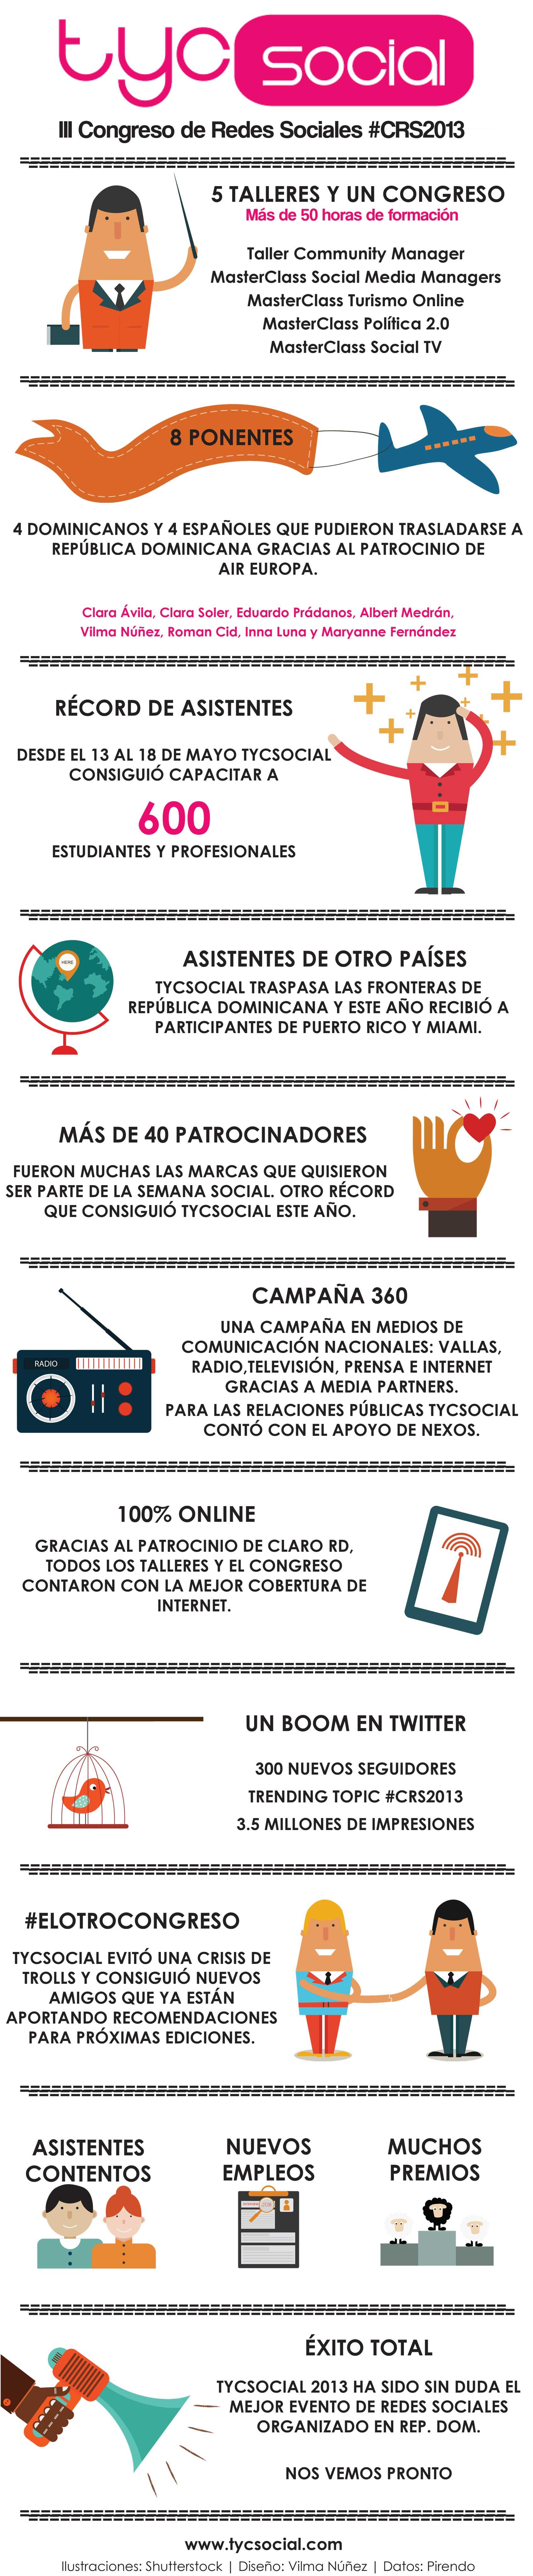 Infografía-tycSocial